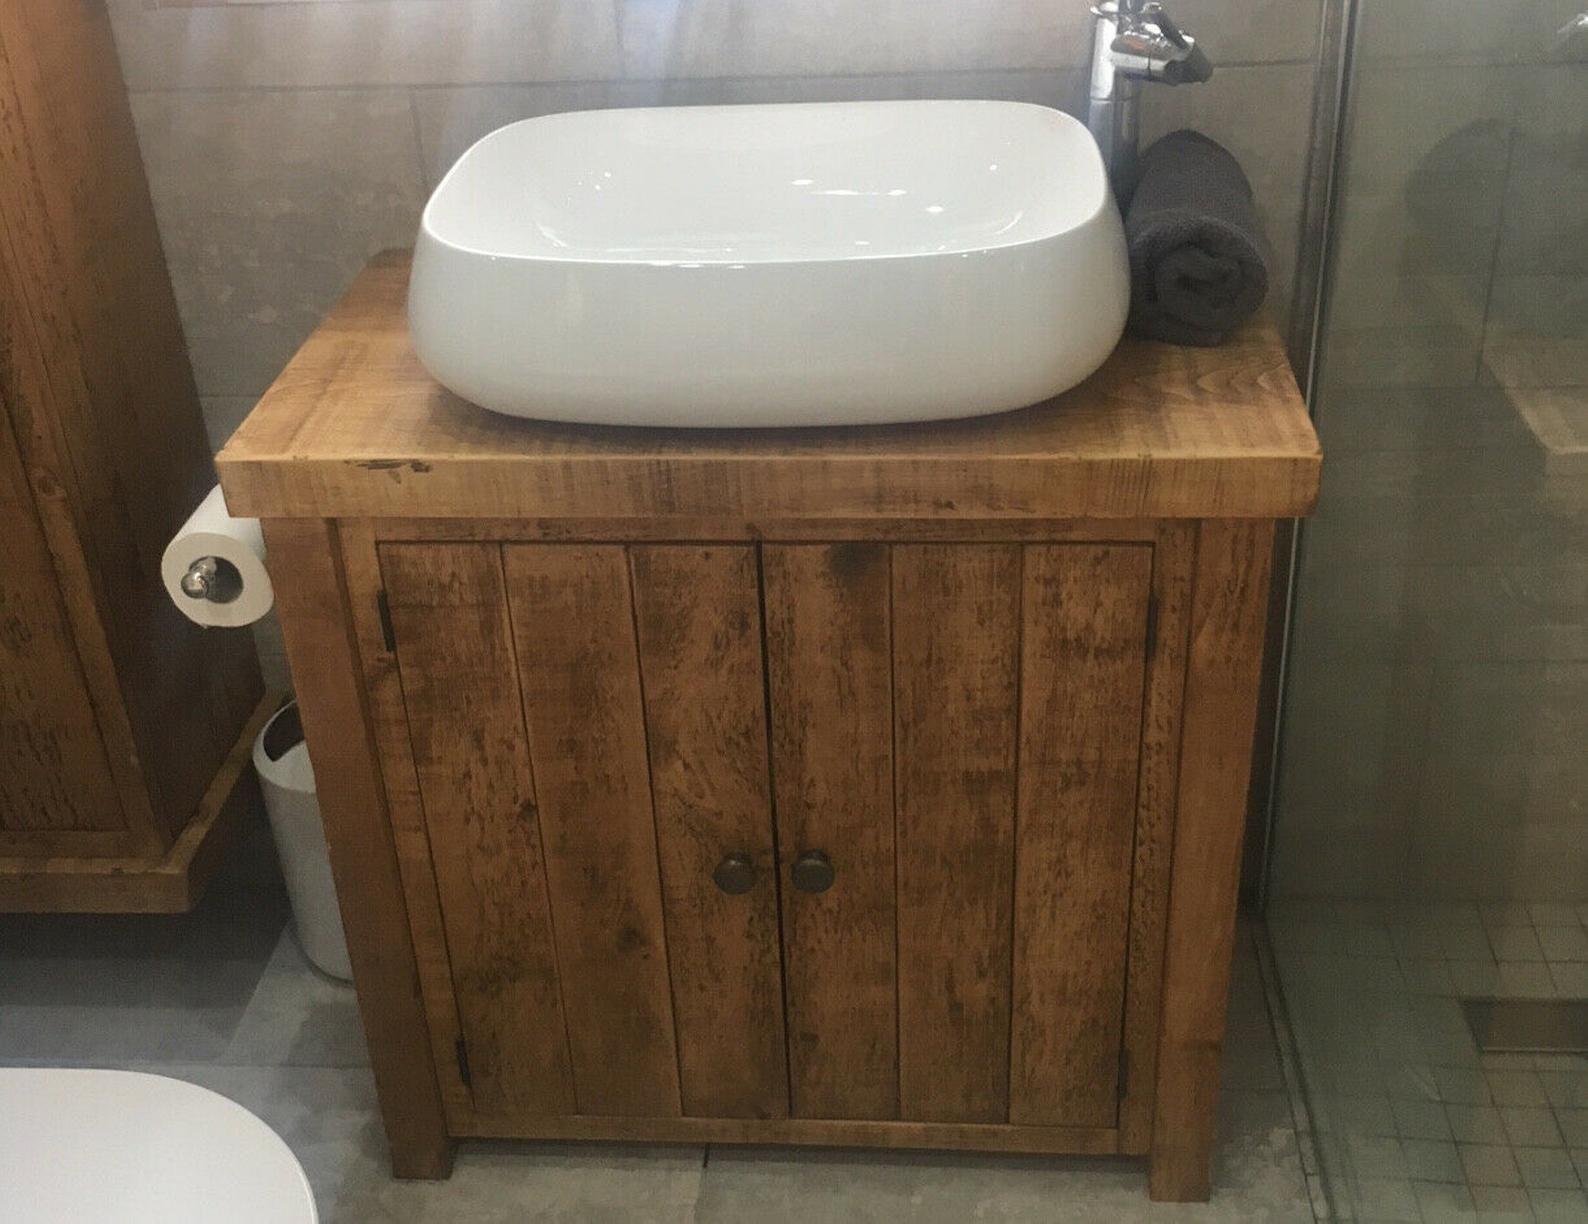 Rustic Plank Solid Wood Bathroom Washstand Vanity Sink Unit Small